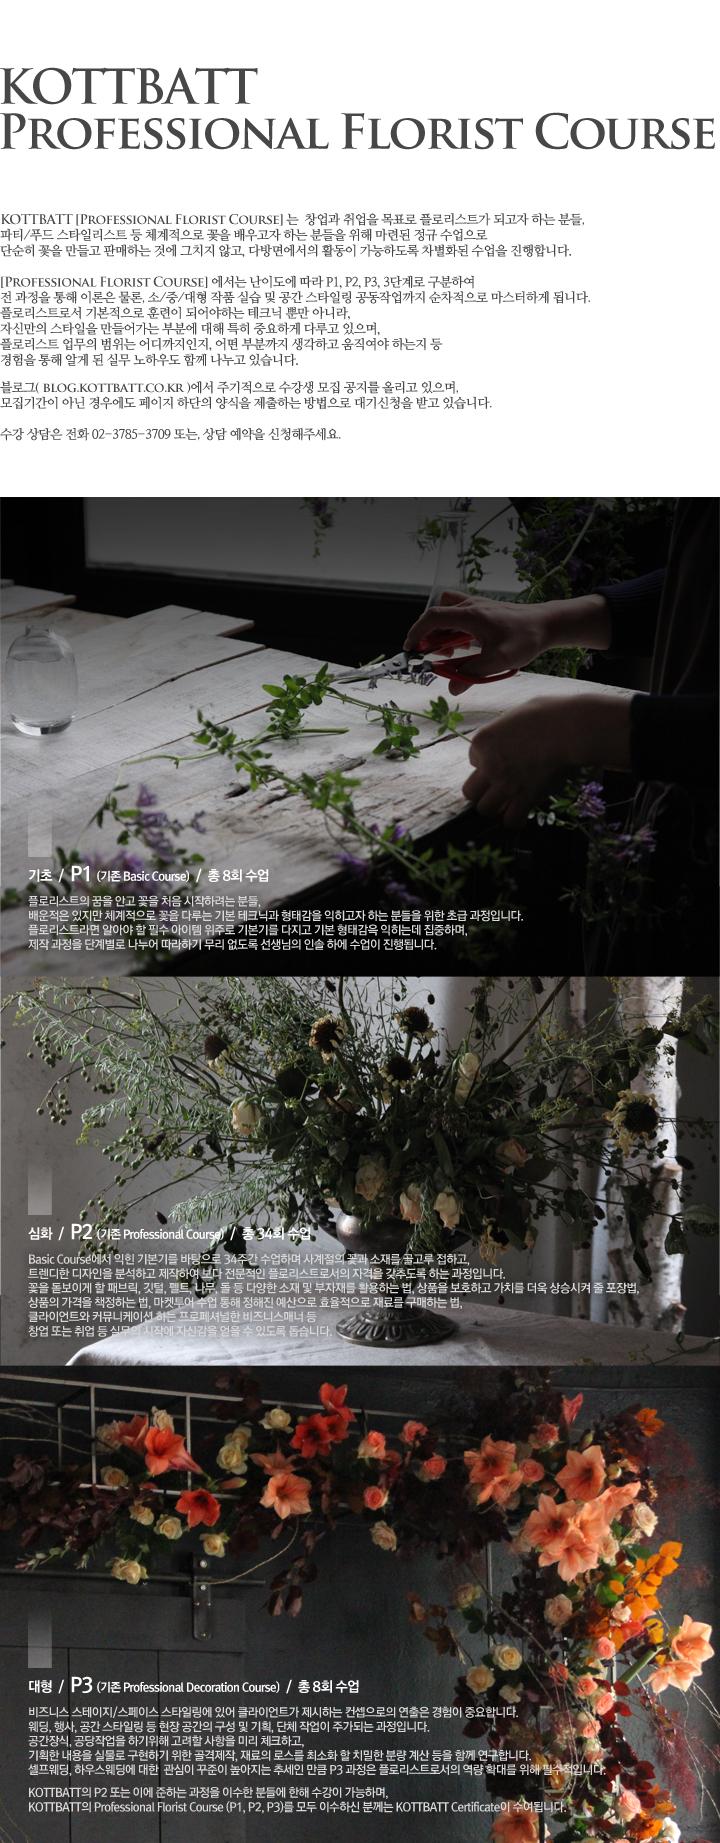 kottbatt_hp_school_Professional Florist Course 안내.jpg